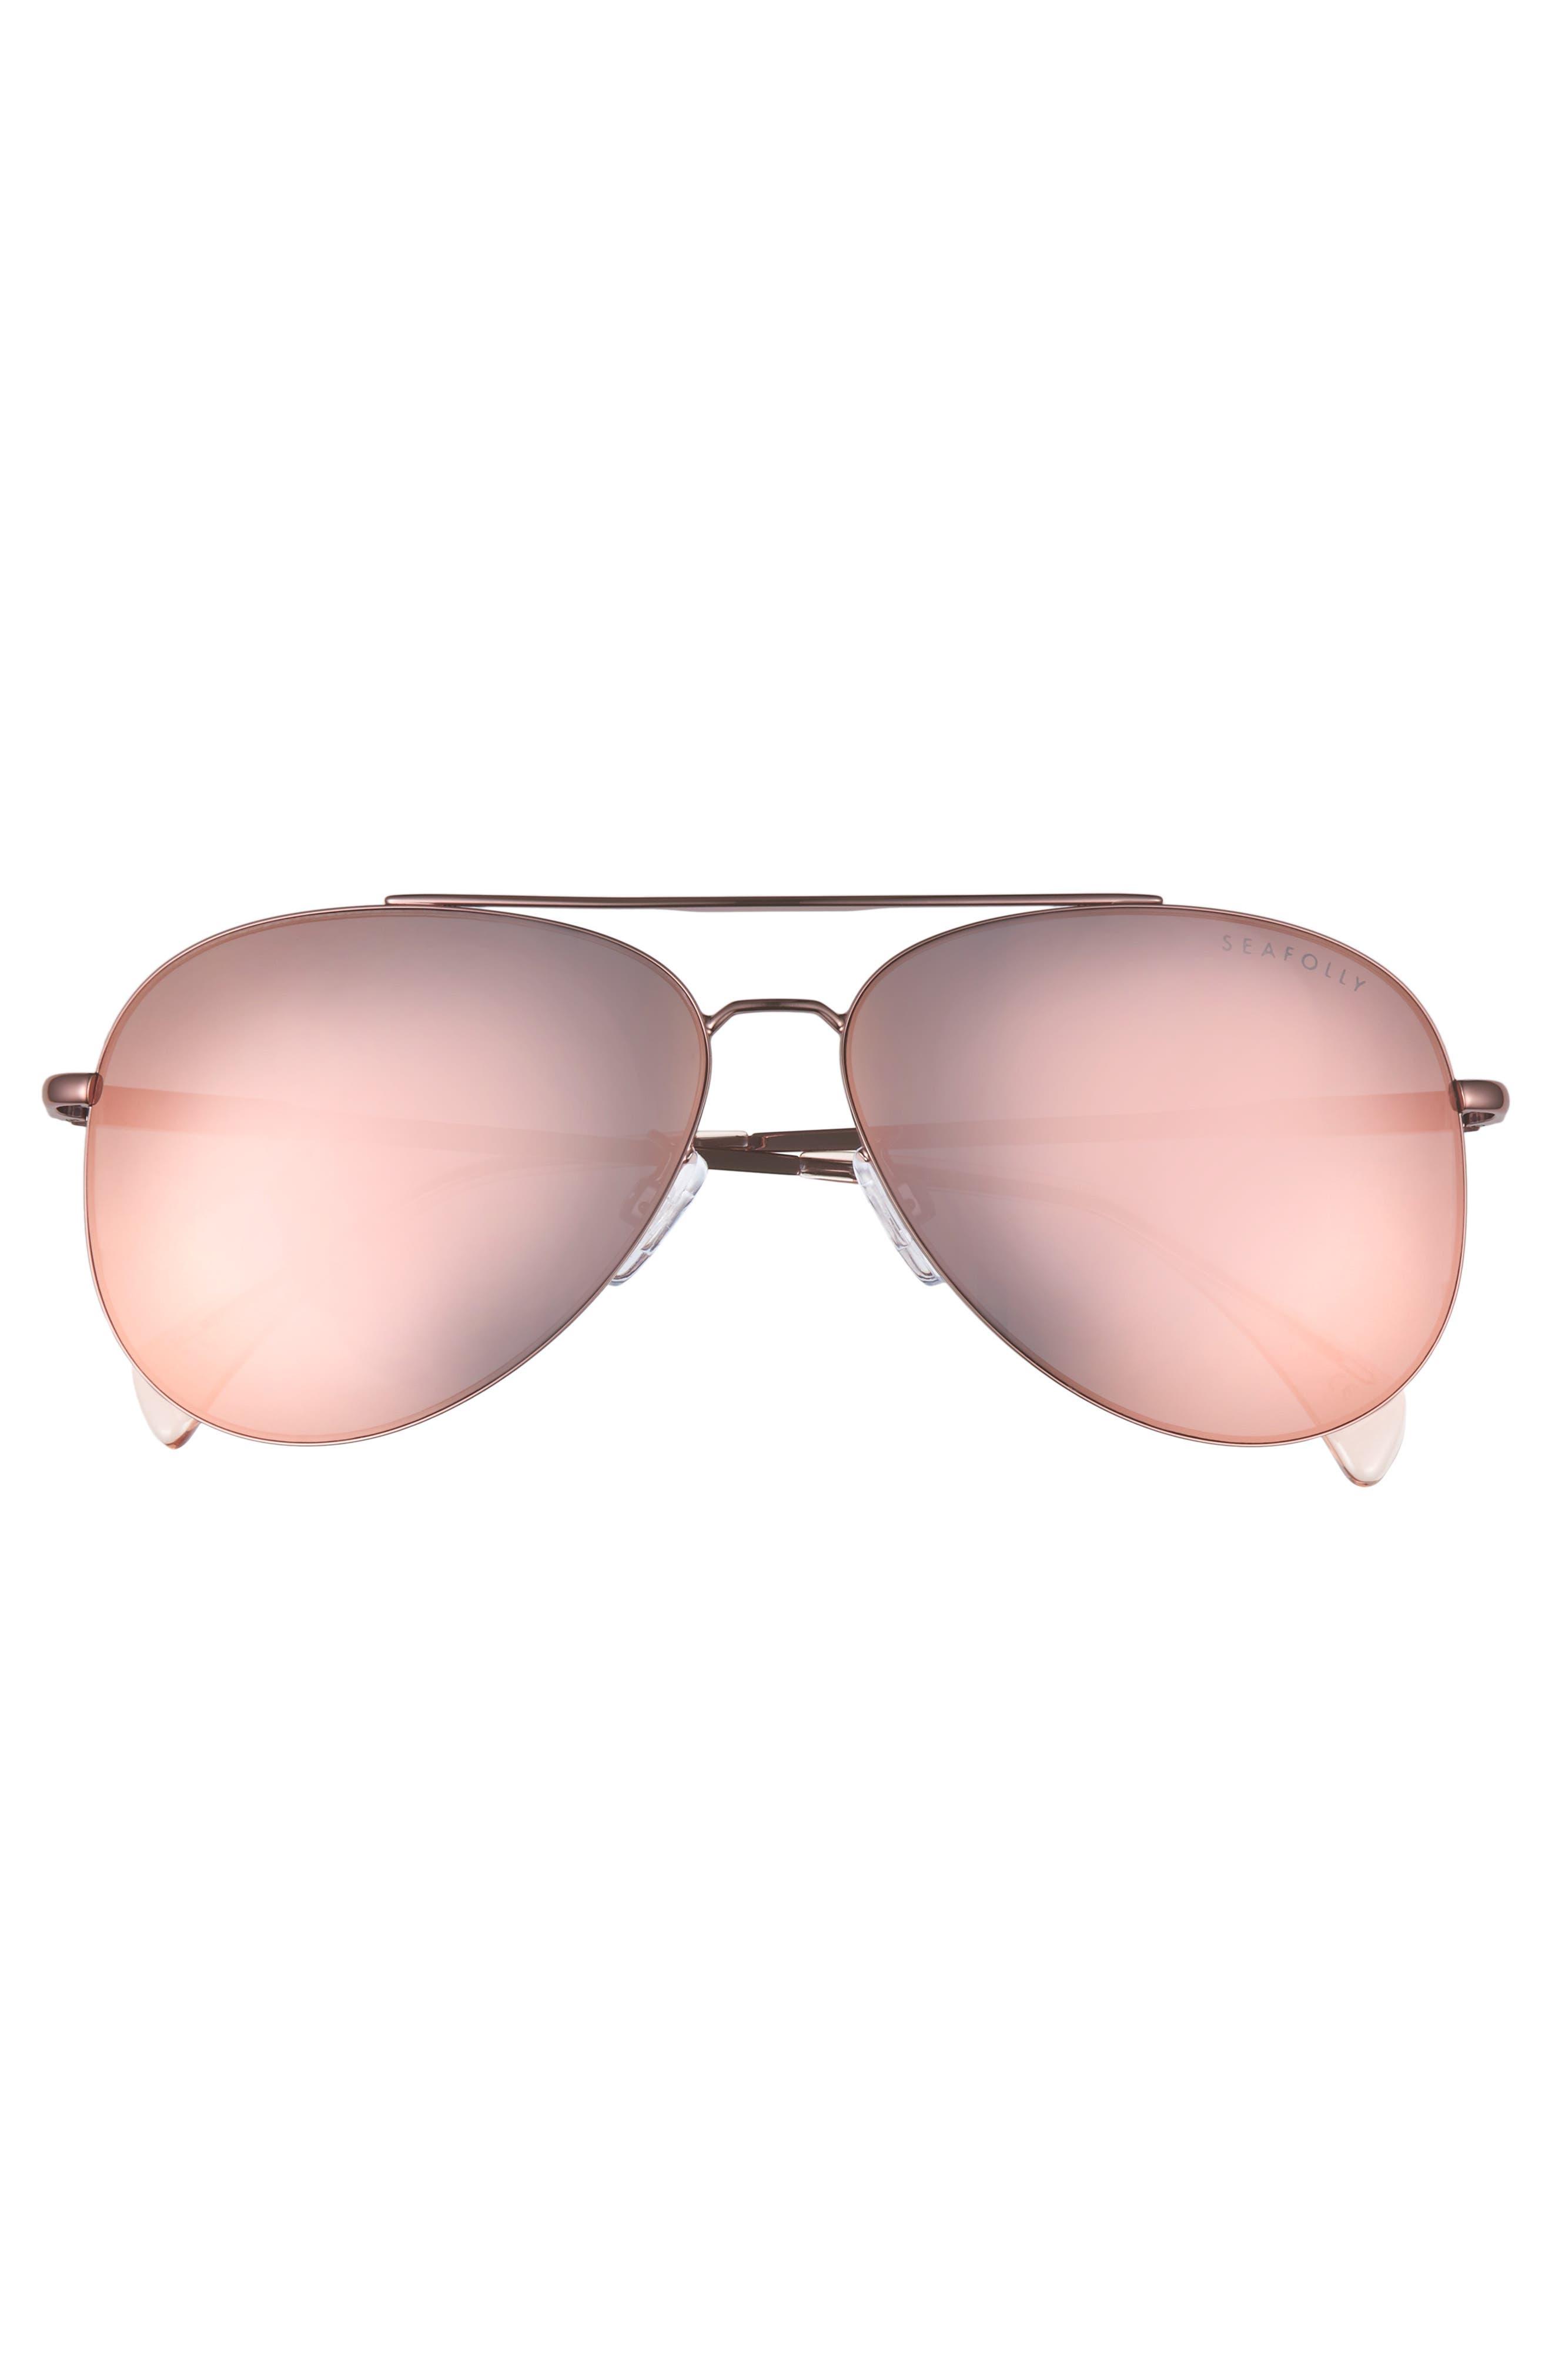 Hiva Oa 58mm Aviator Sunglasses,                             Alternate thumbnail 3, color,                             BALLET